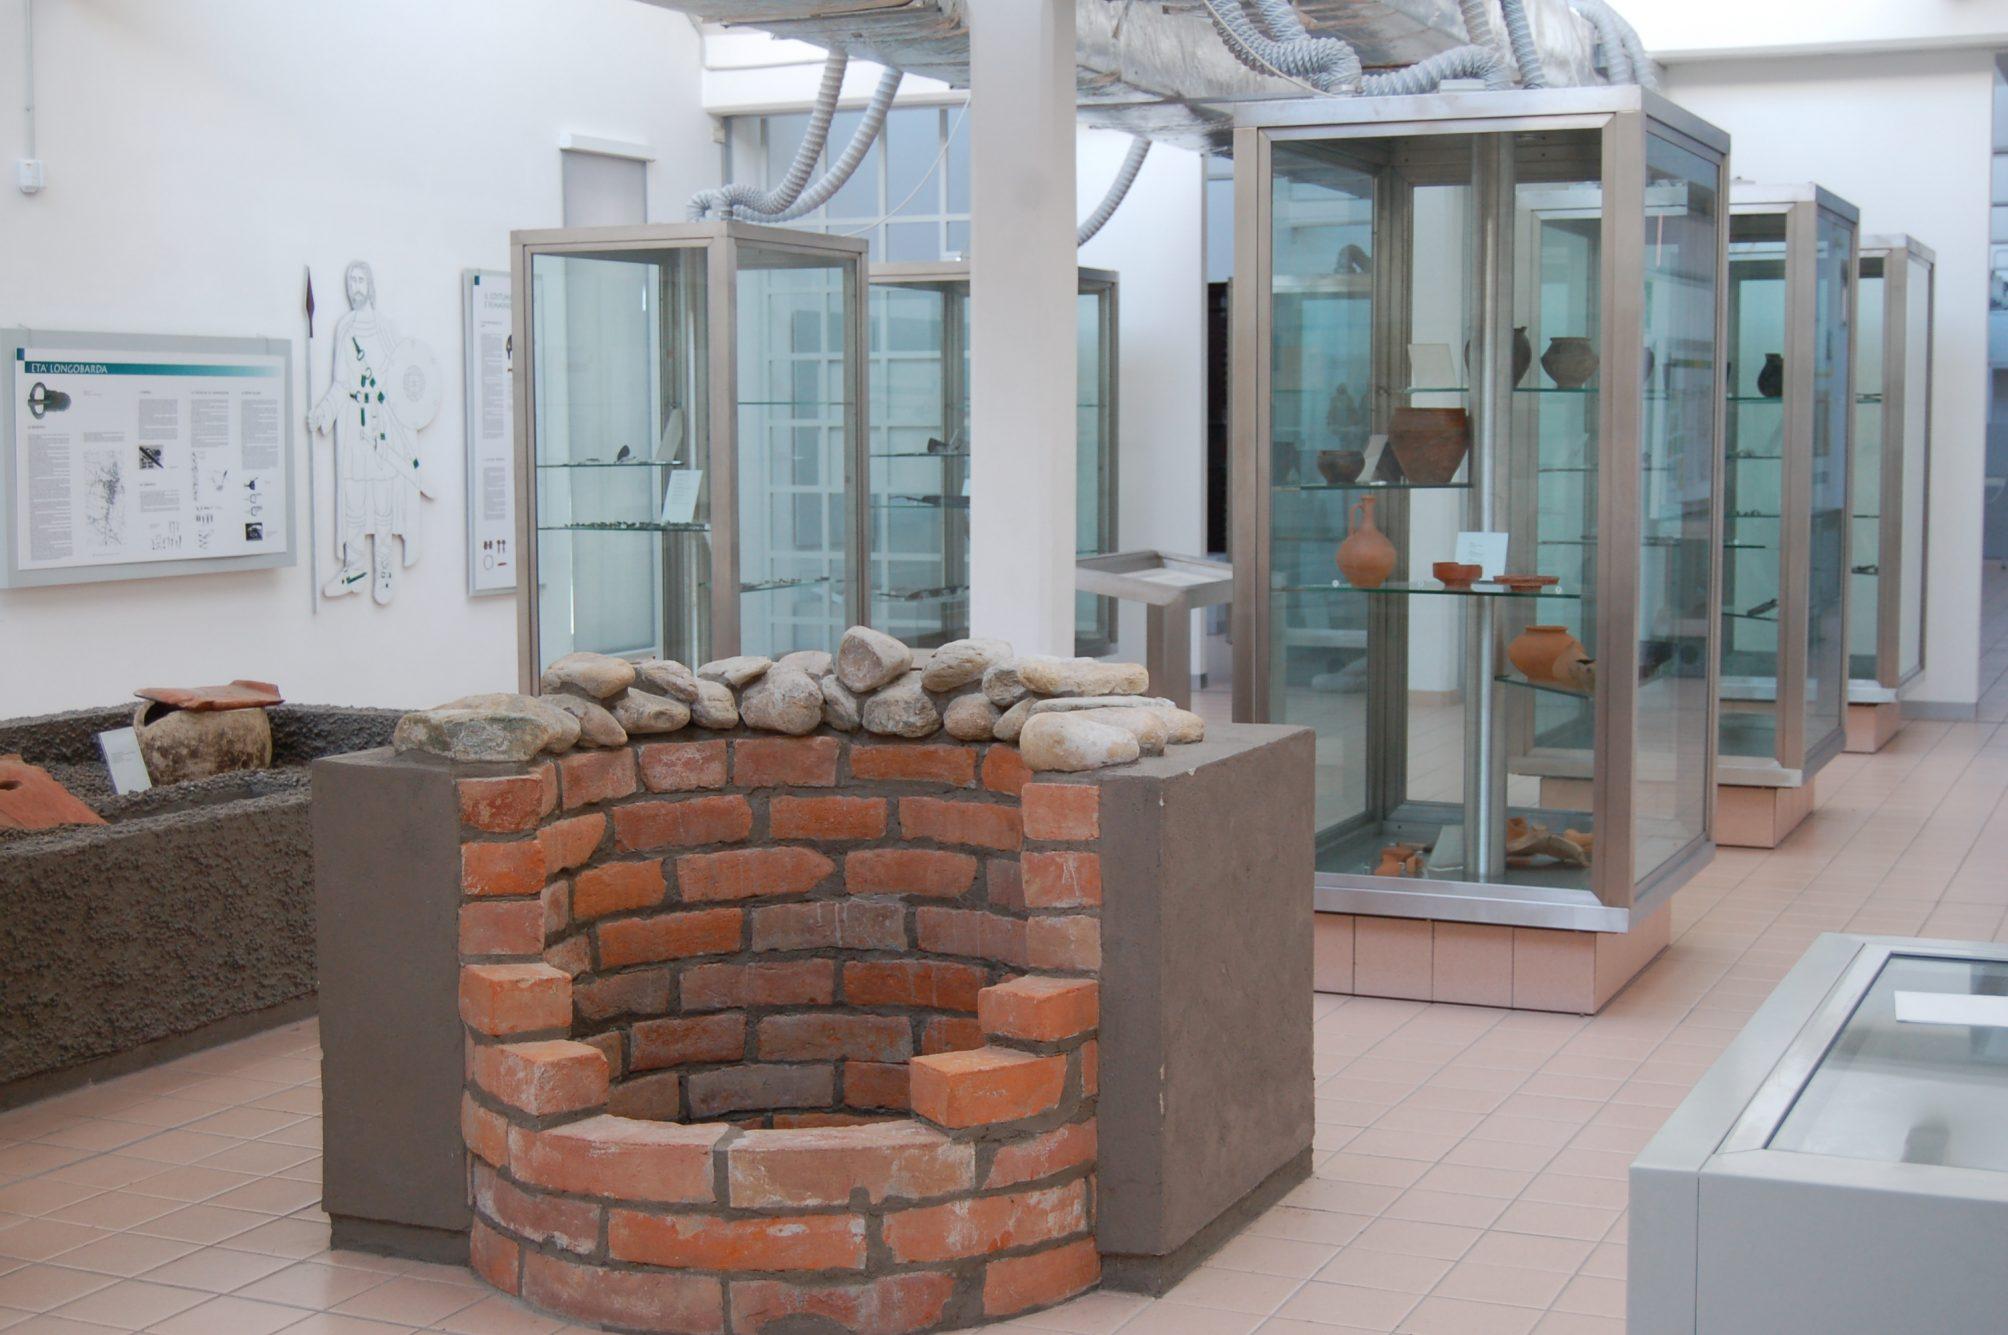 Museo Civico Giacomo Rodolfo